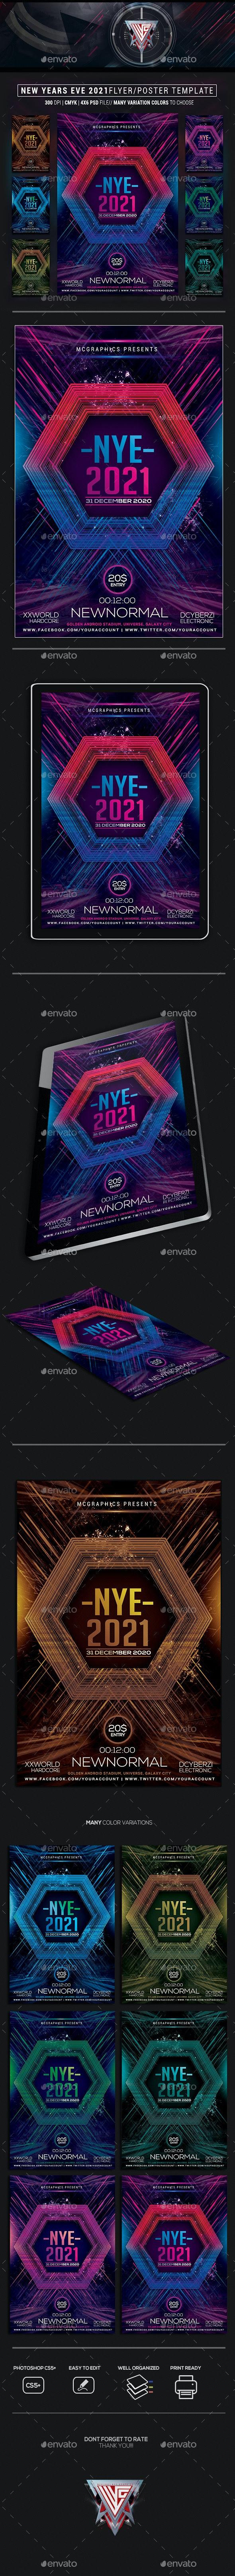 NYE 2021 Photoshop Flyer Template - Events Flyers